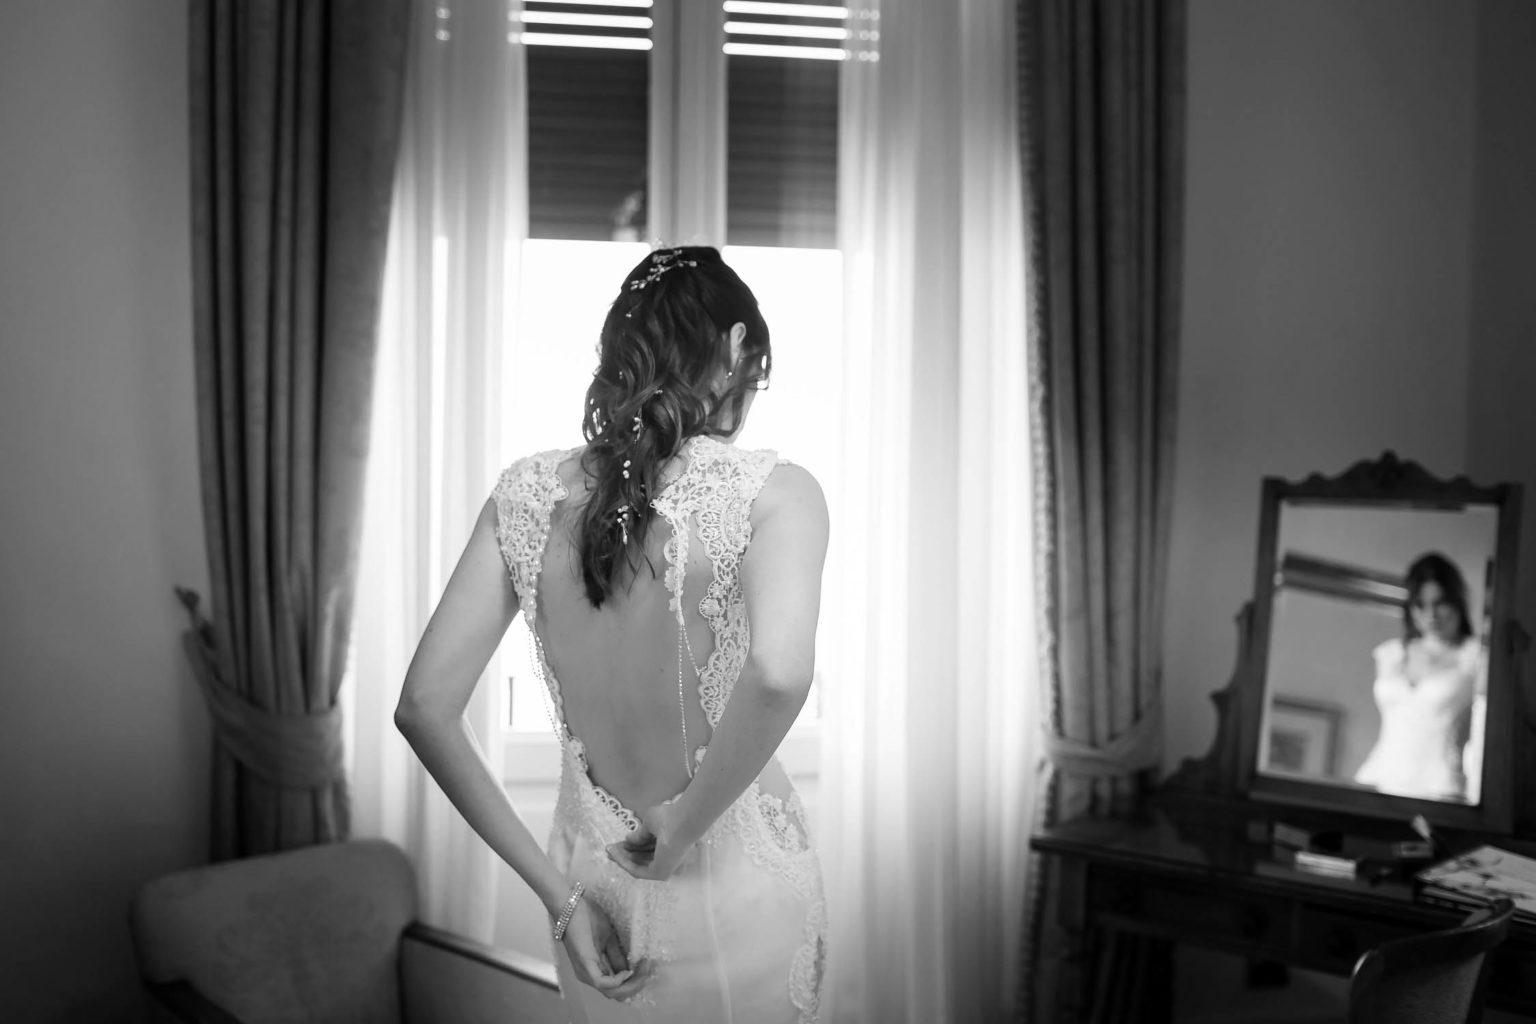 Bride while closing the dress at the San Domenico Palace for wedding in Taormina, wedding photos of Nino Lombardo